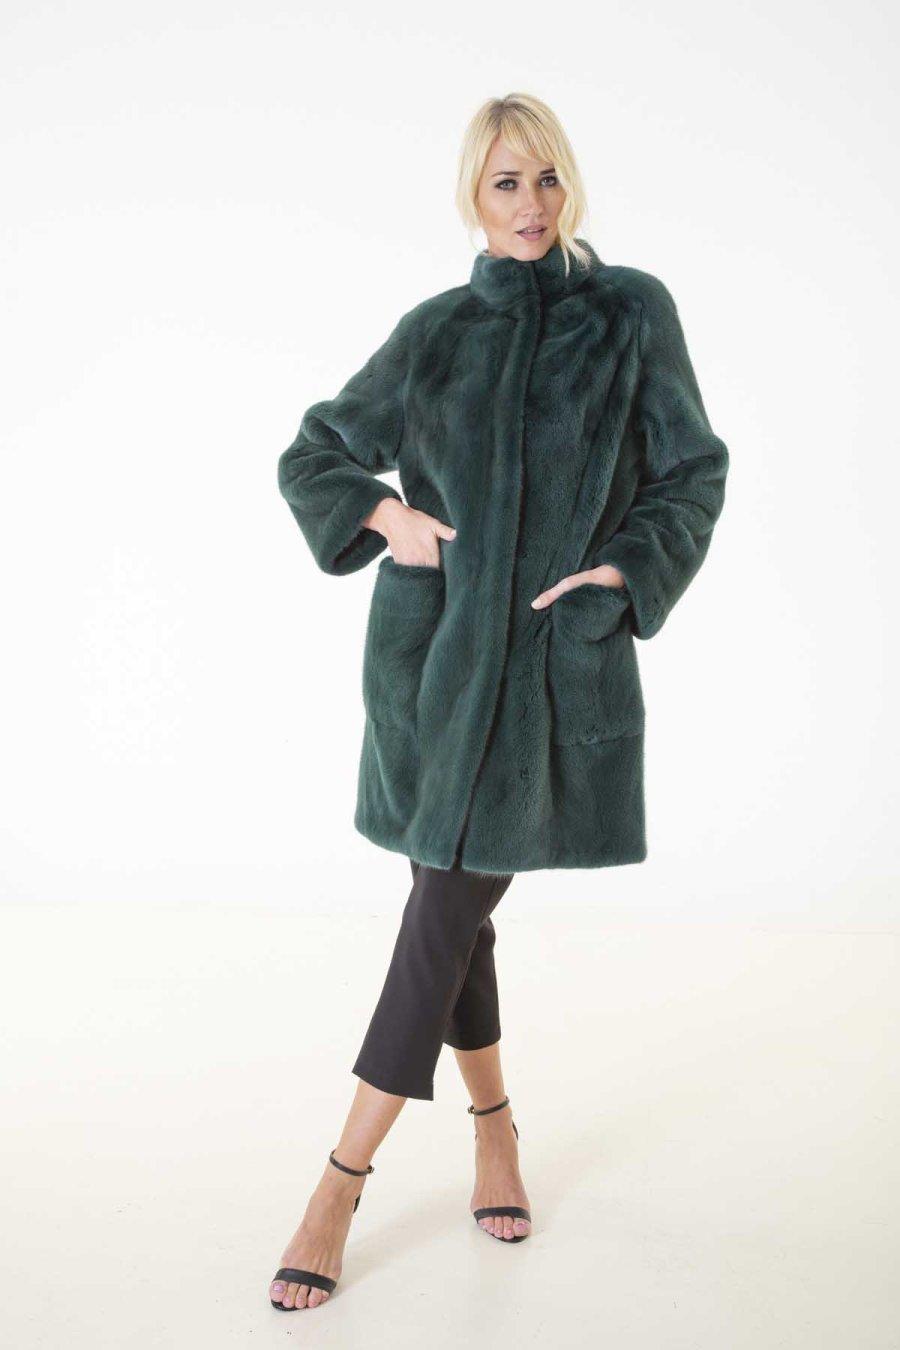 Shock Green Male Mink Fur Jacket | Пальто из норки цвета Shock Green - Sarigianni Furs